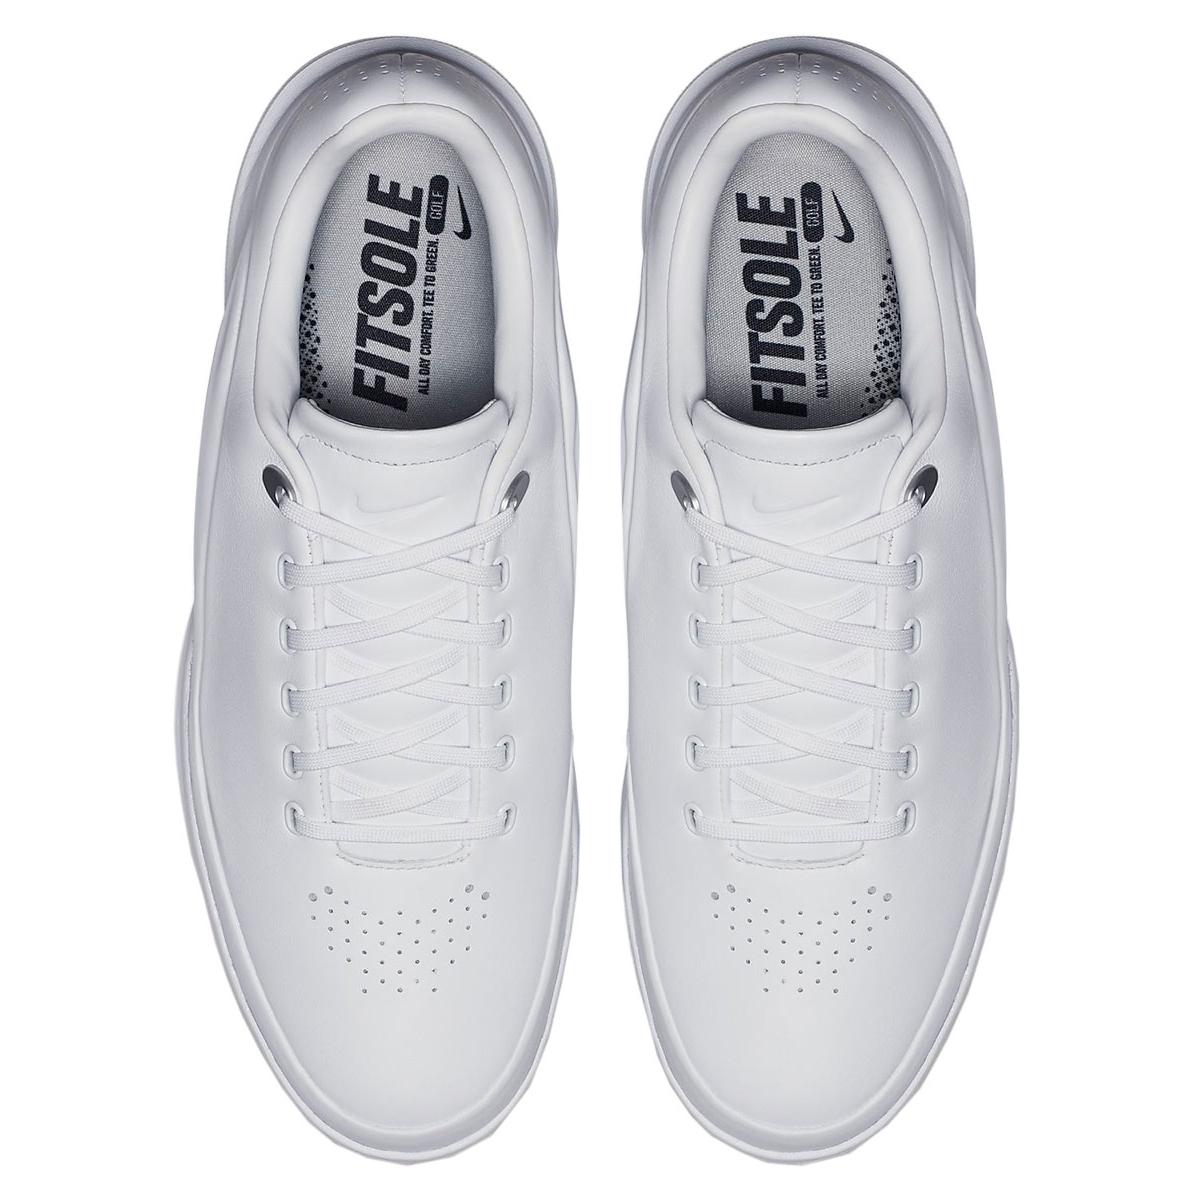 b5ca4835b8096 Nike Golf Air Zoom Precision Shoes from american golf